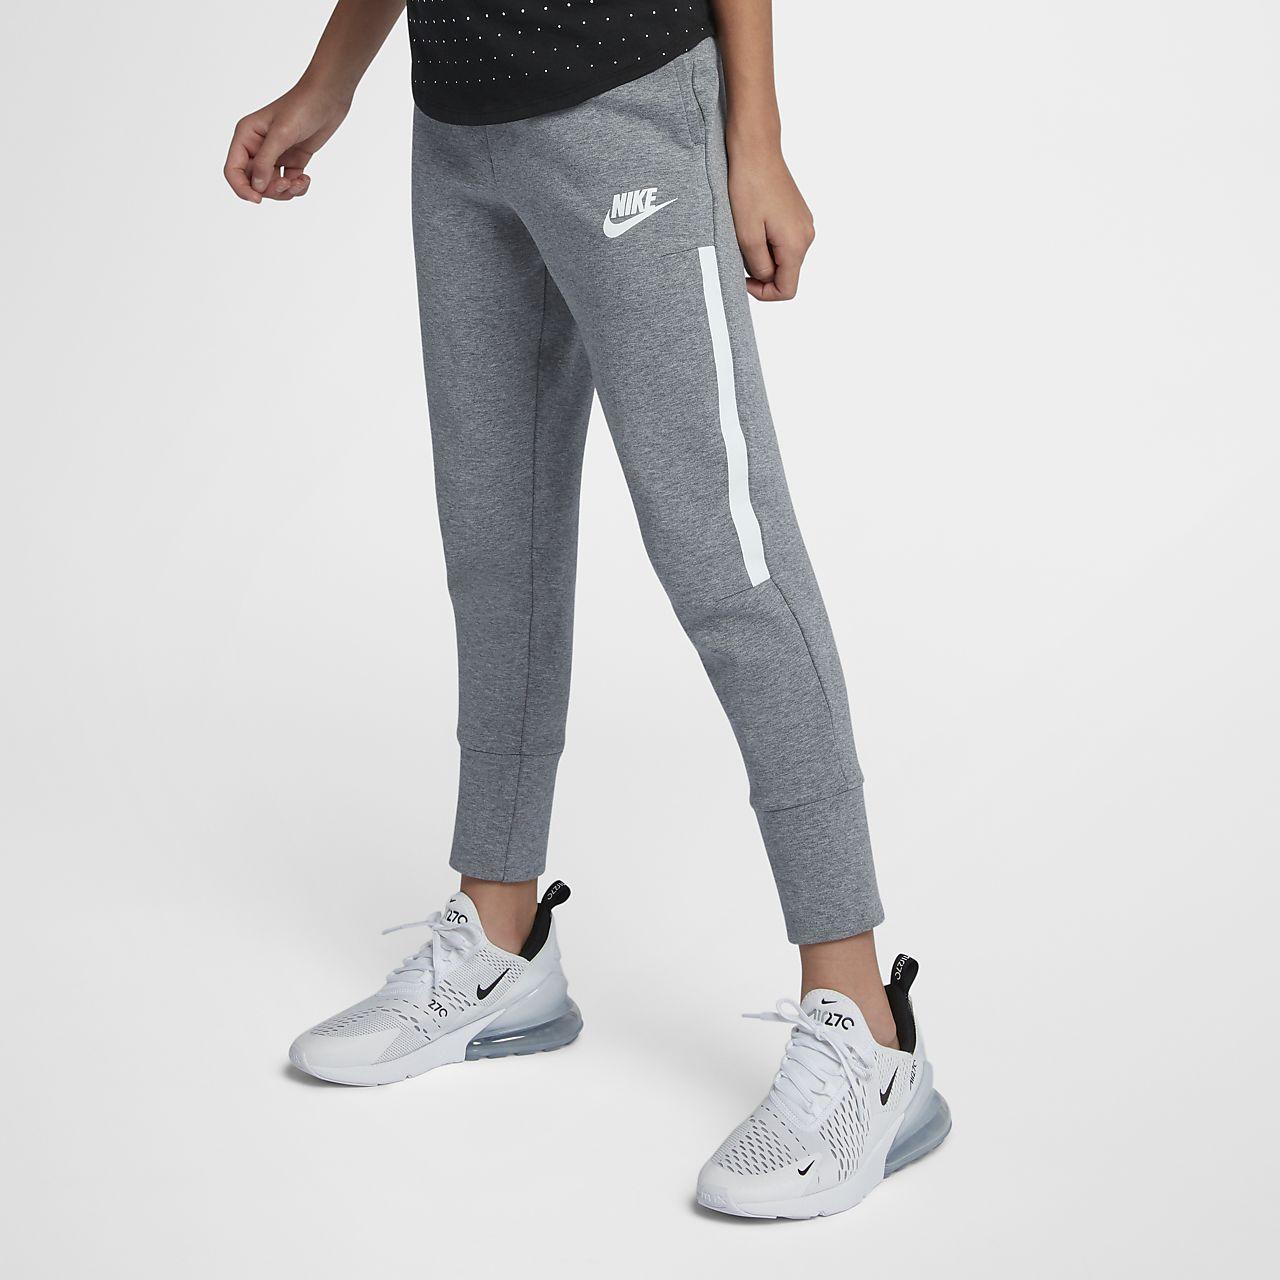 dbb403f0ba3 Nike Sportswear Tech Fleece Big Kids  (Girls ) Pants. Nike.com